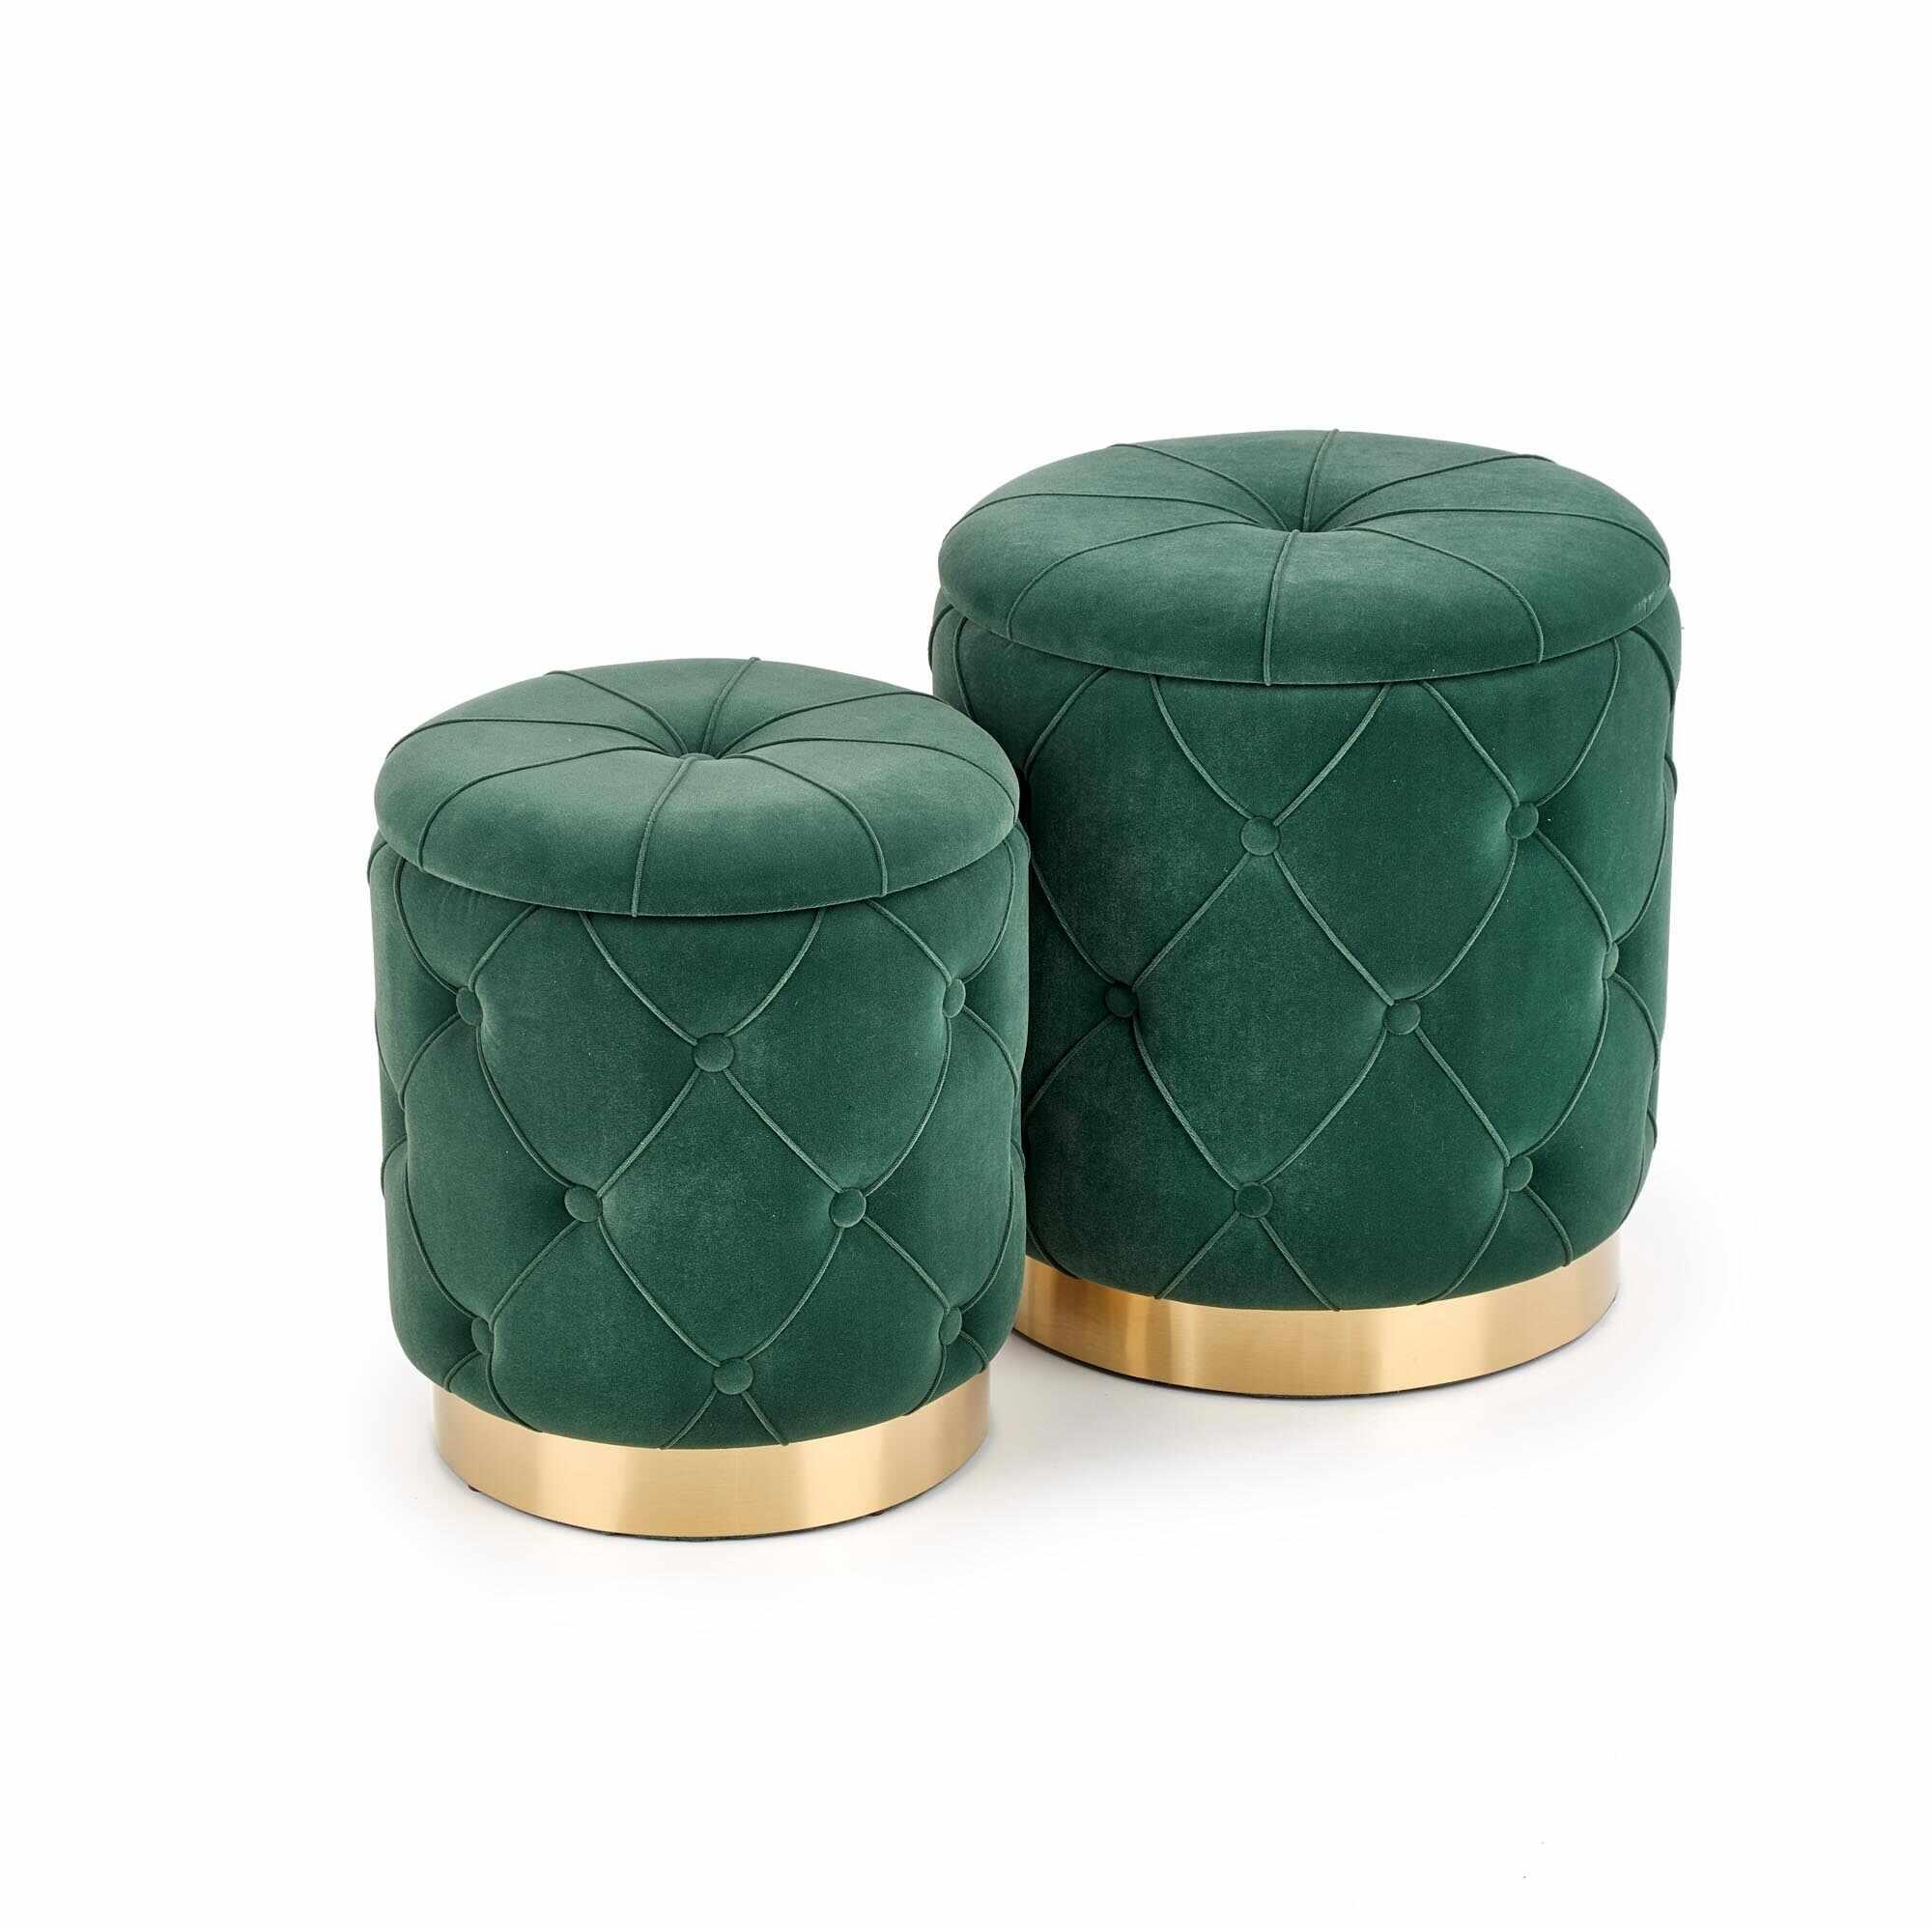 Set 2 taburete tapitate cu stofa si spatiu de depozitare Polly Verde inchis, Ø40xH44 / Ø33xH38 cm la pret 411 lei